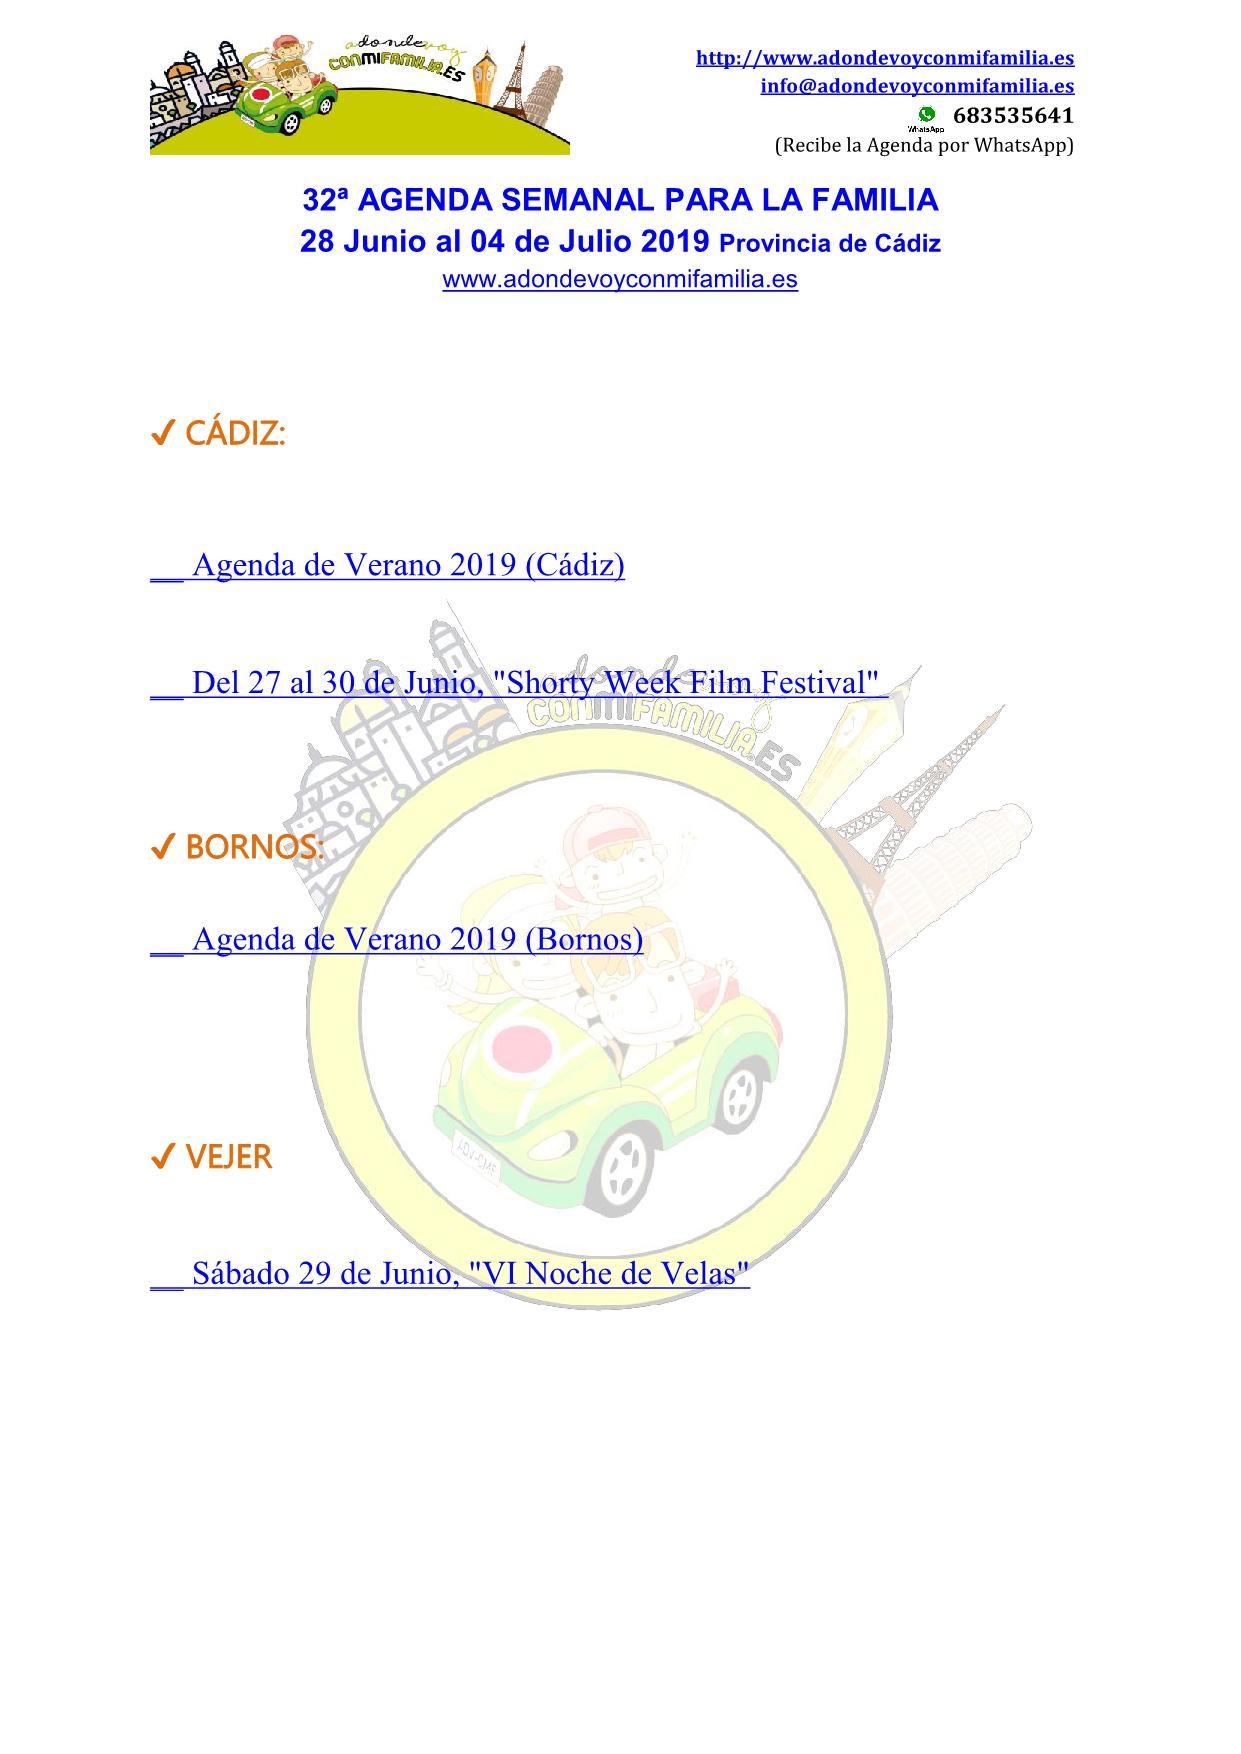 032 Agenda semanal familiar 28 junio al 04 Julio 2019